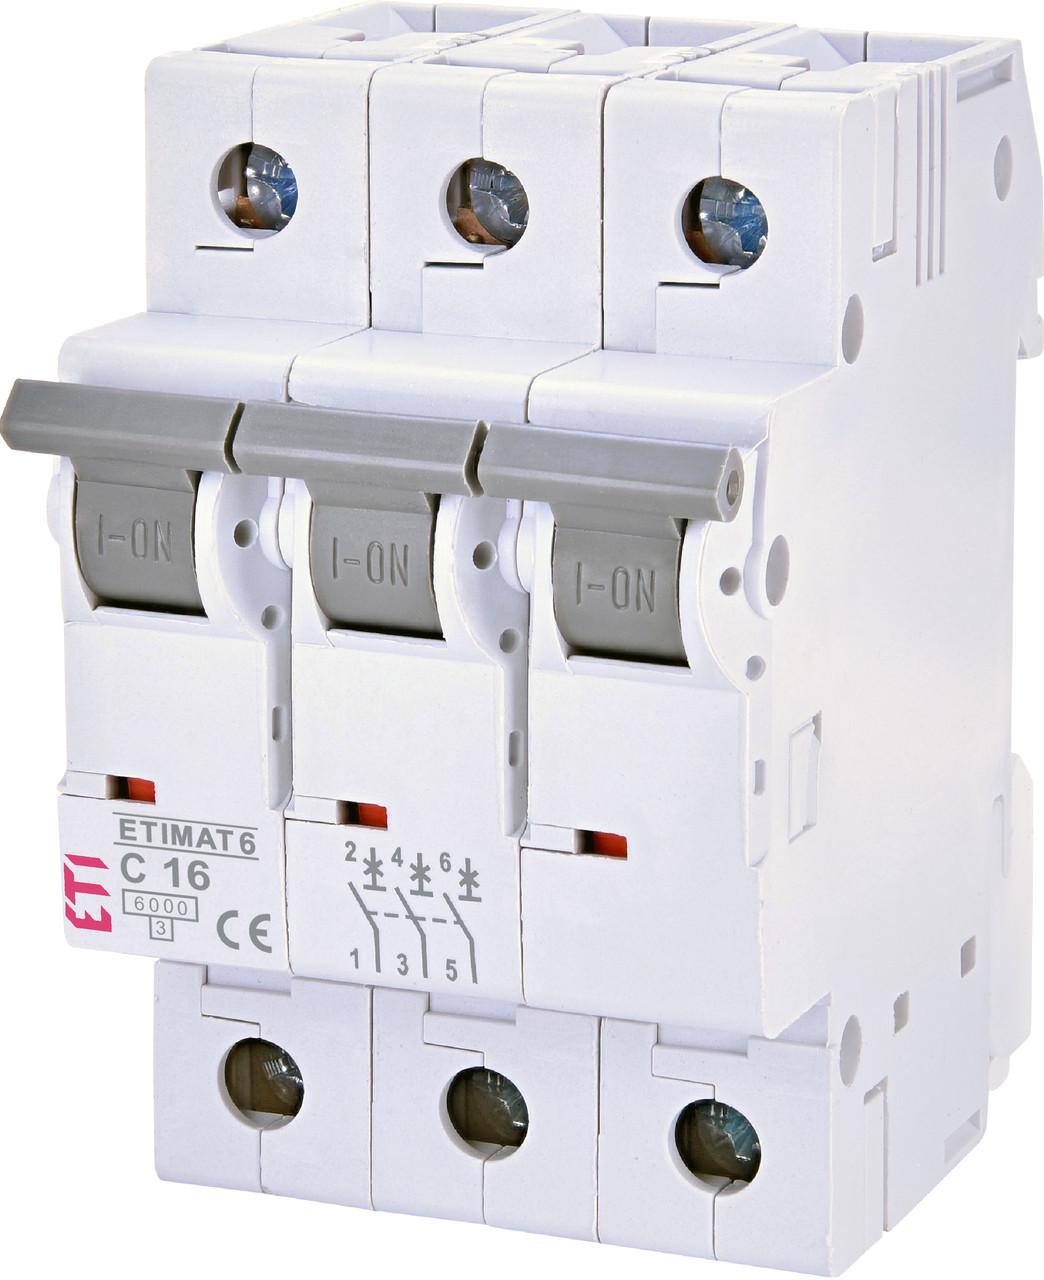 Авт. вимикач ETI ETIMAT 6 3p 16A C 6kA 2145516